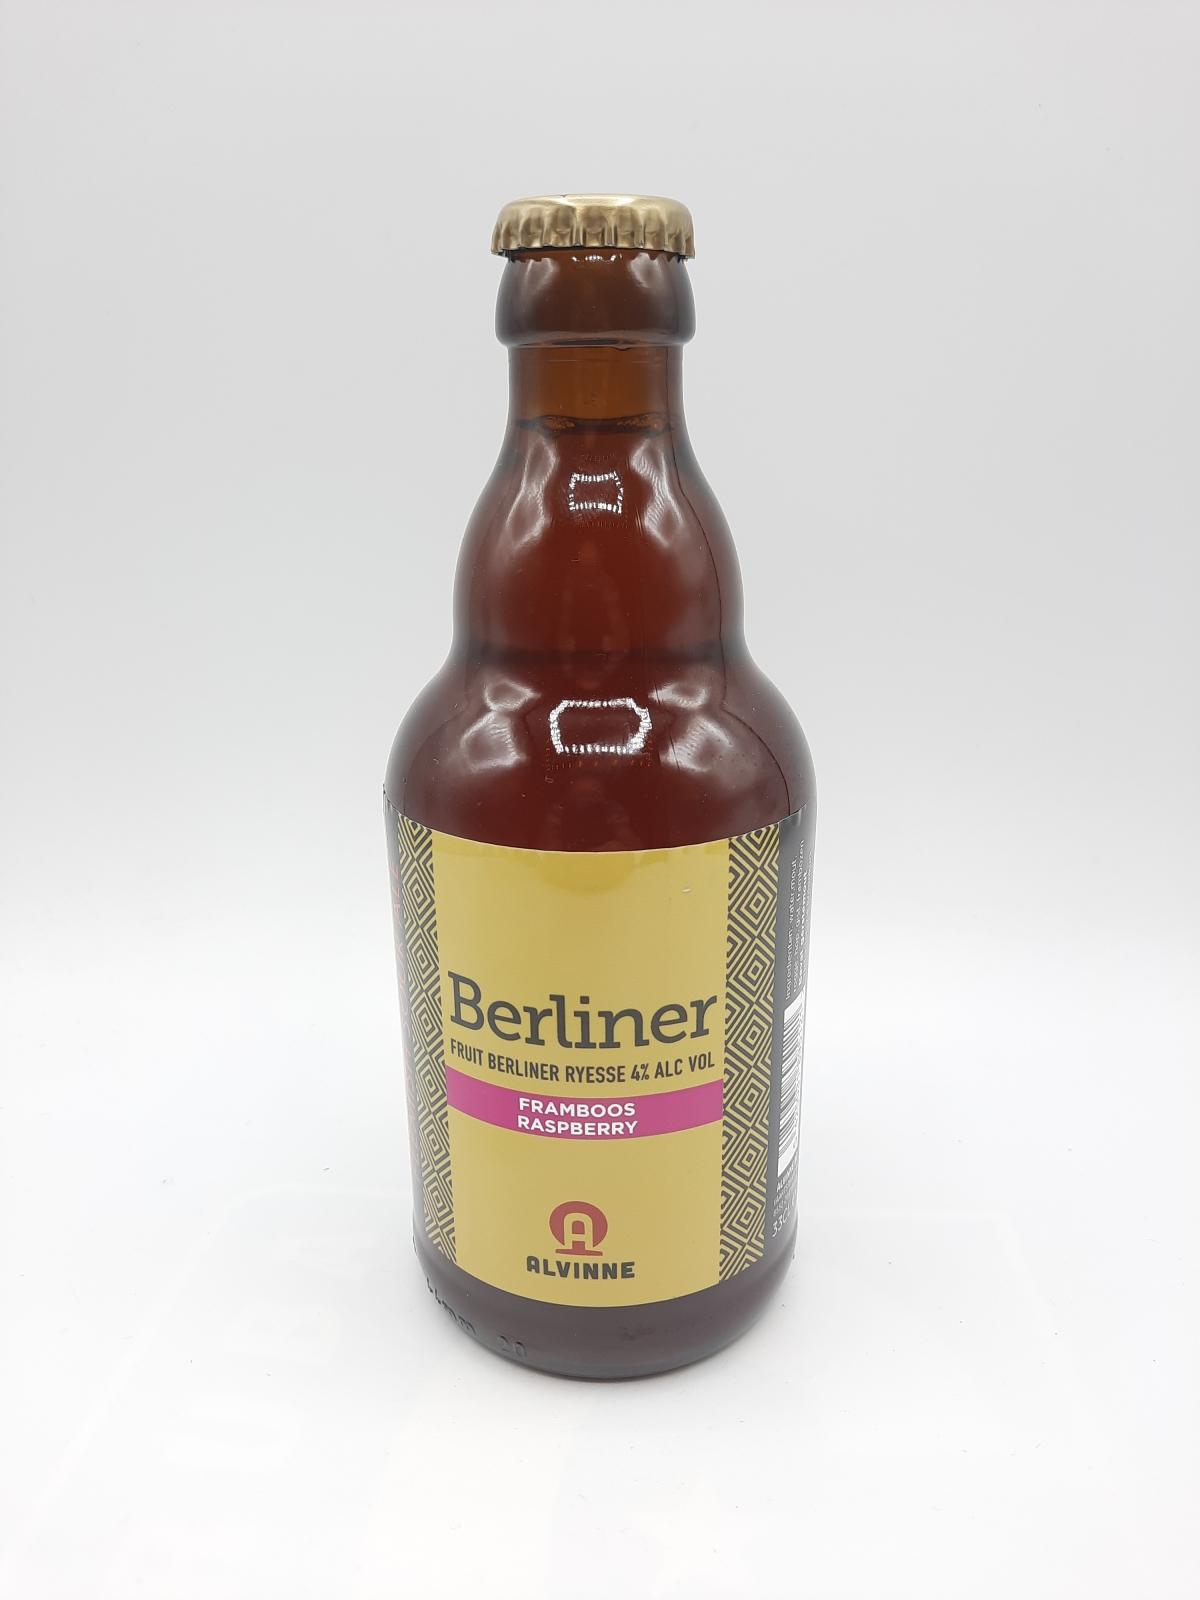 Img Berliner Framboos